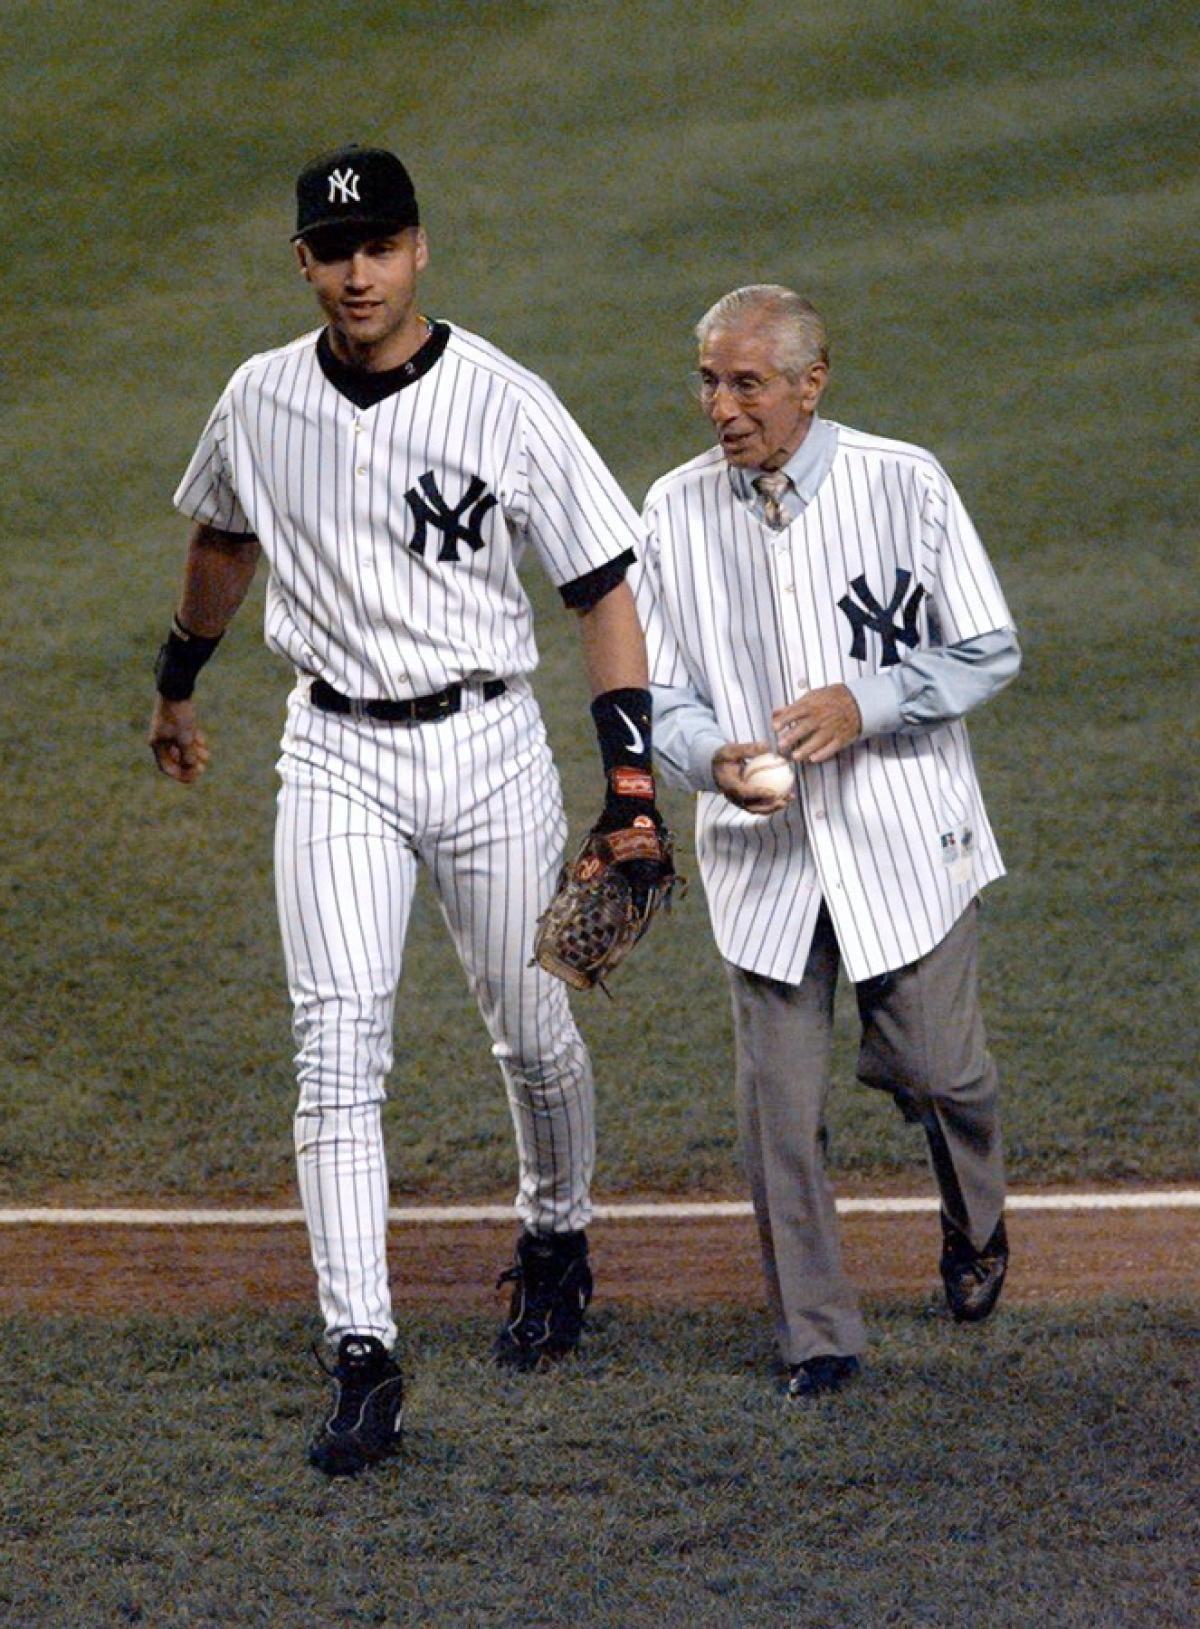 1998 Jeter Still Just 24 Is Already Making His Mark As An All Time Great Yankee Shortstop In The Ve Derek Jeter New York Yankees Baseball Baseball Records